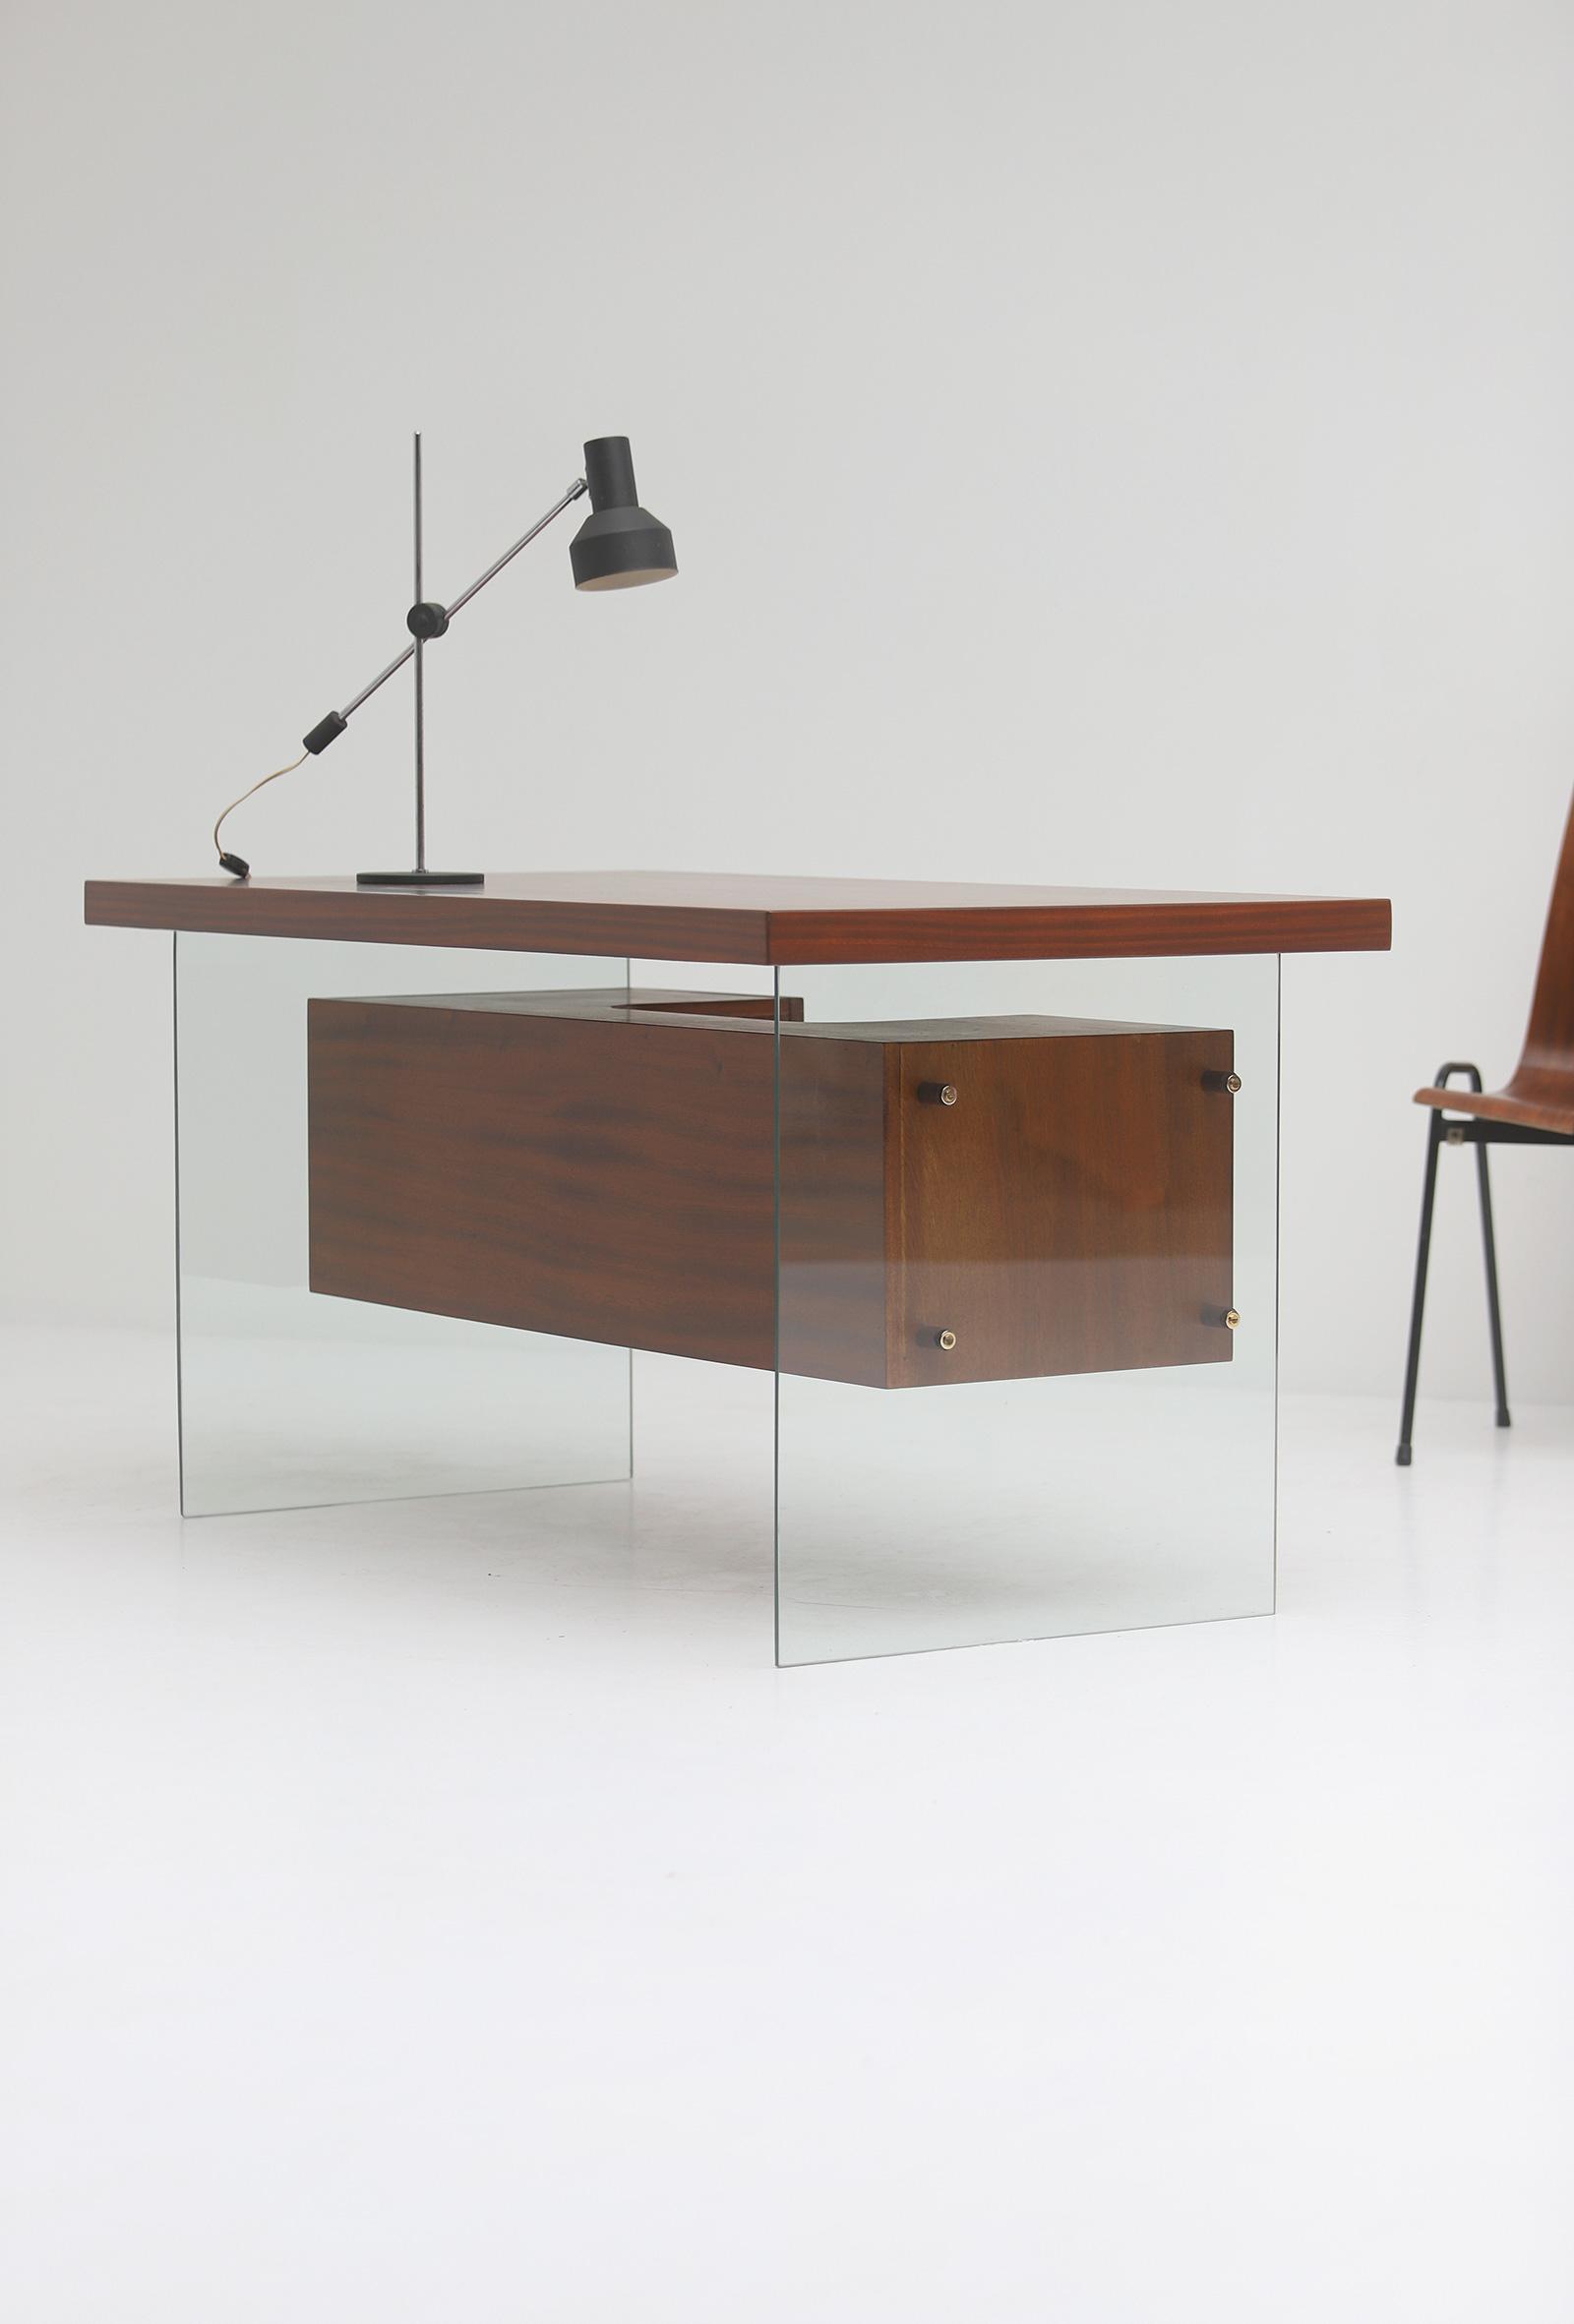 Modernist desk in the manner of Jacques Dumond, 1950simage 2